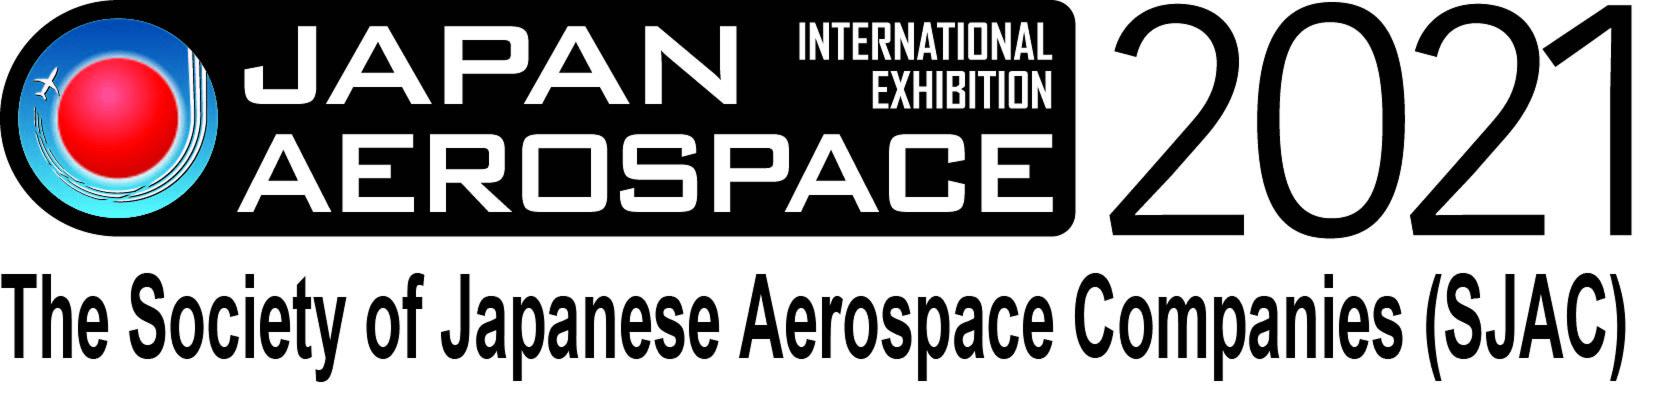 The Society of Japanese Aerospace Companies